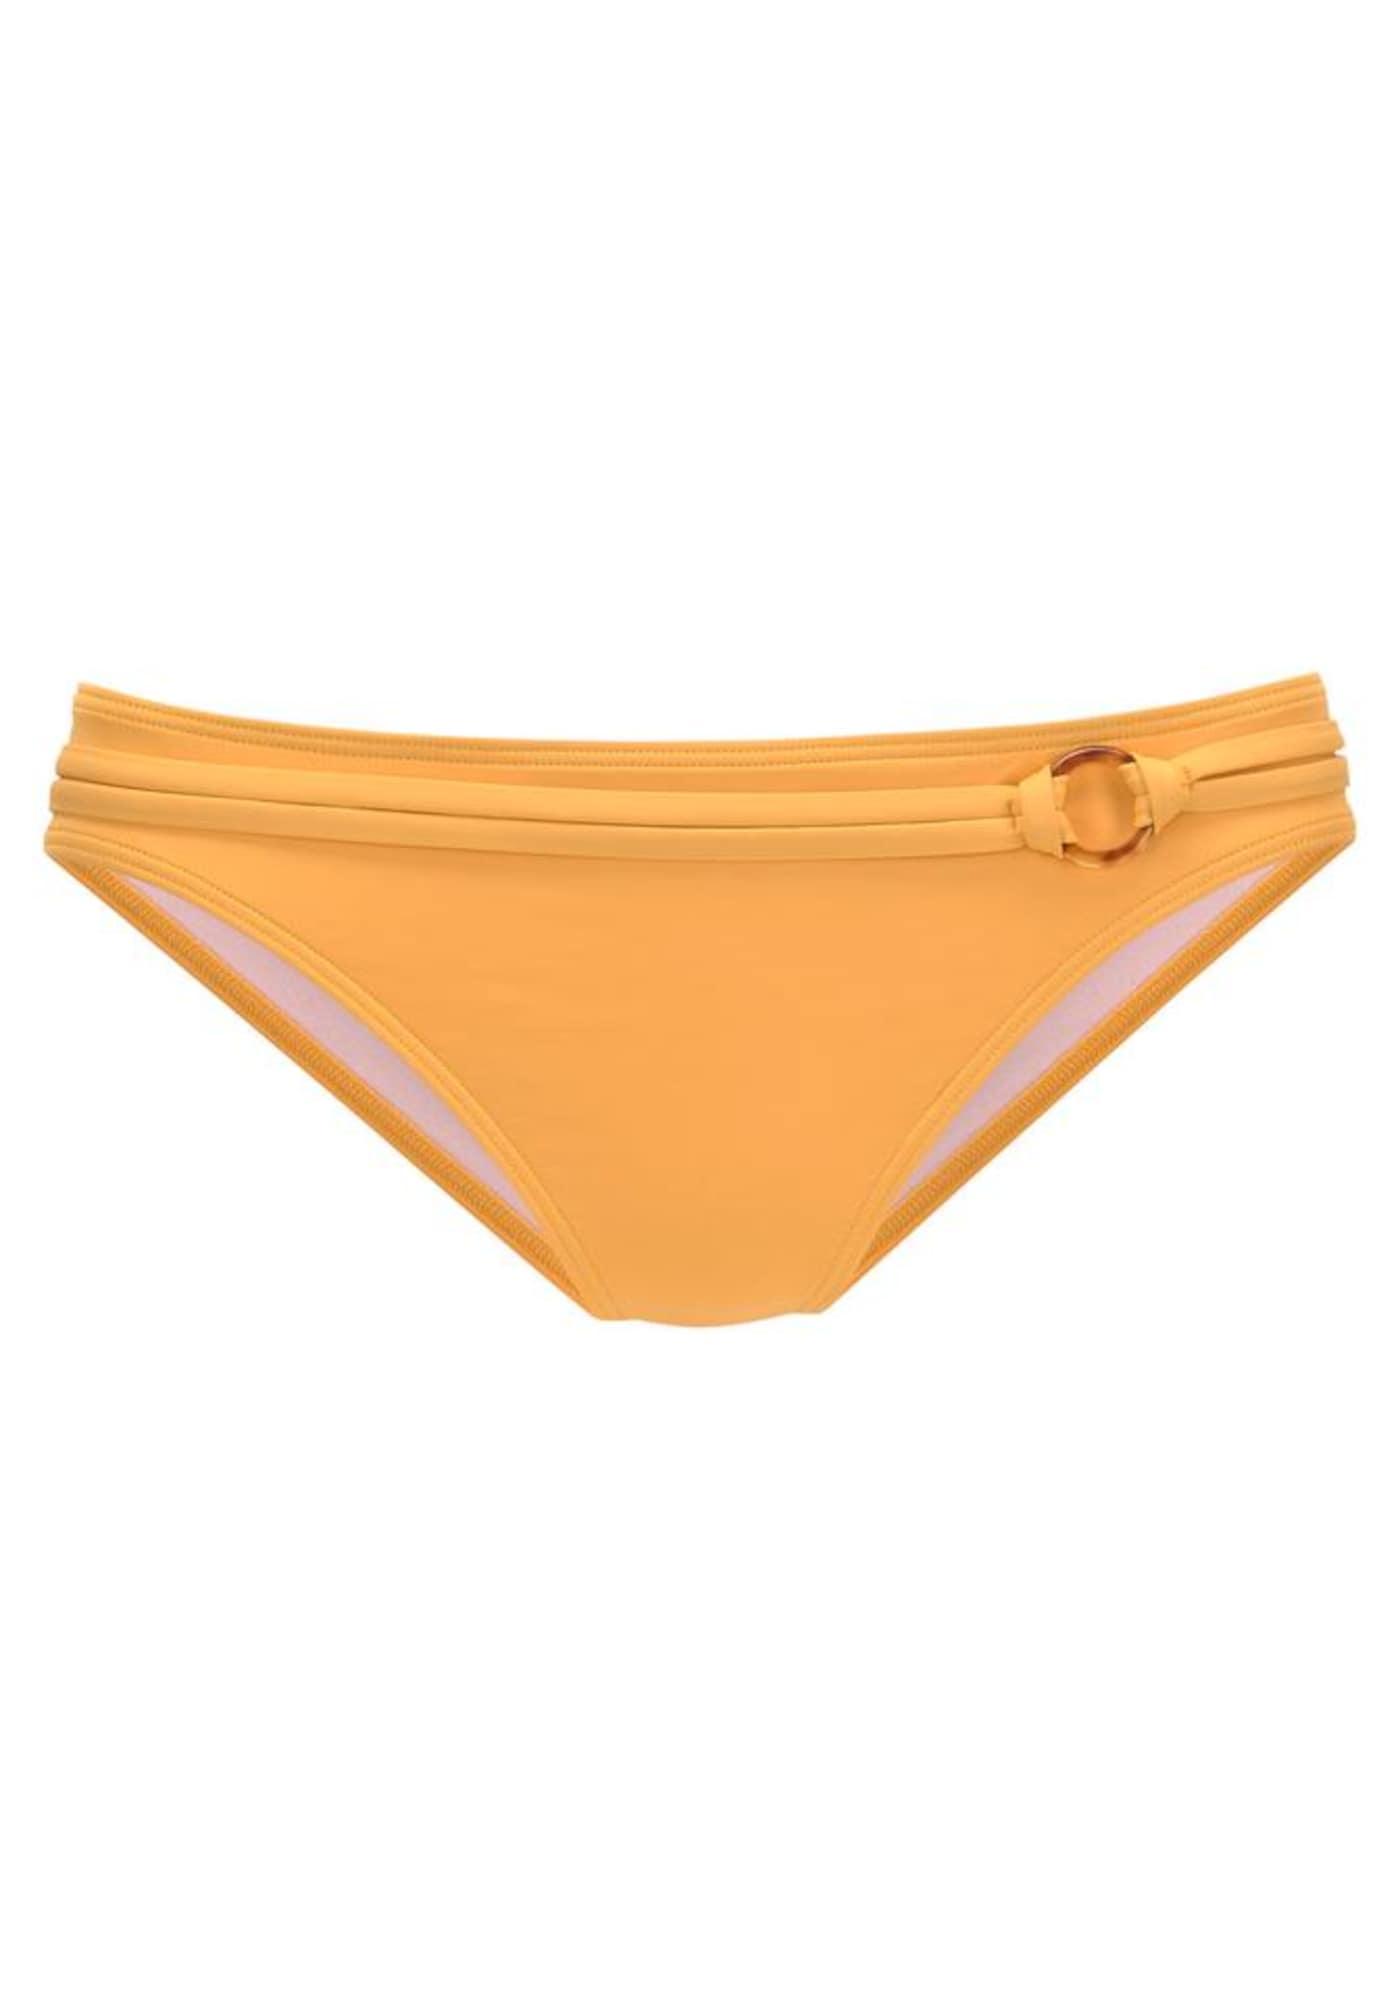 s.Oliver Bikinio kelnaitės geltona